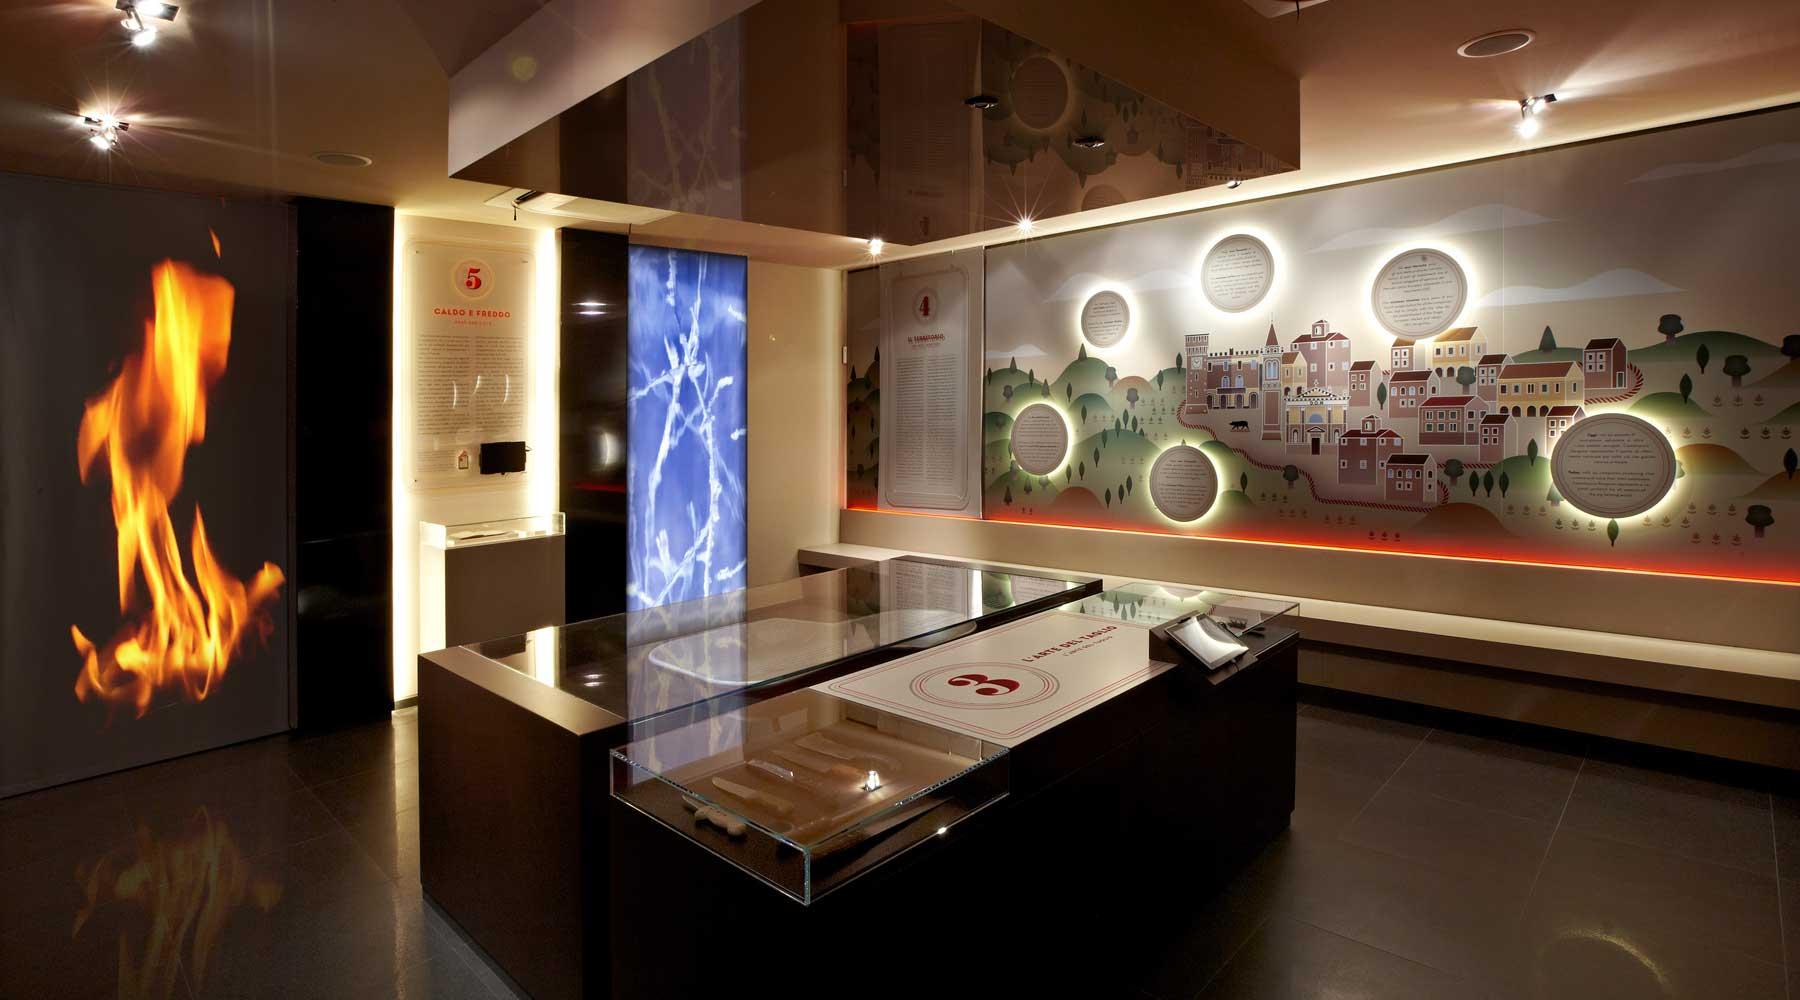 musa-museo-salumeria-villani-2